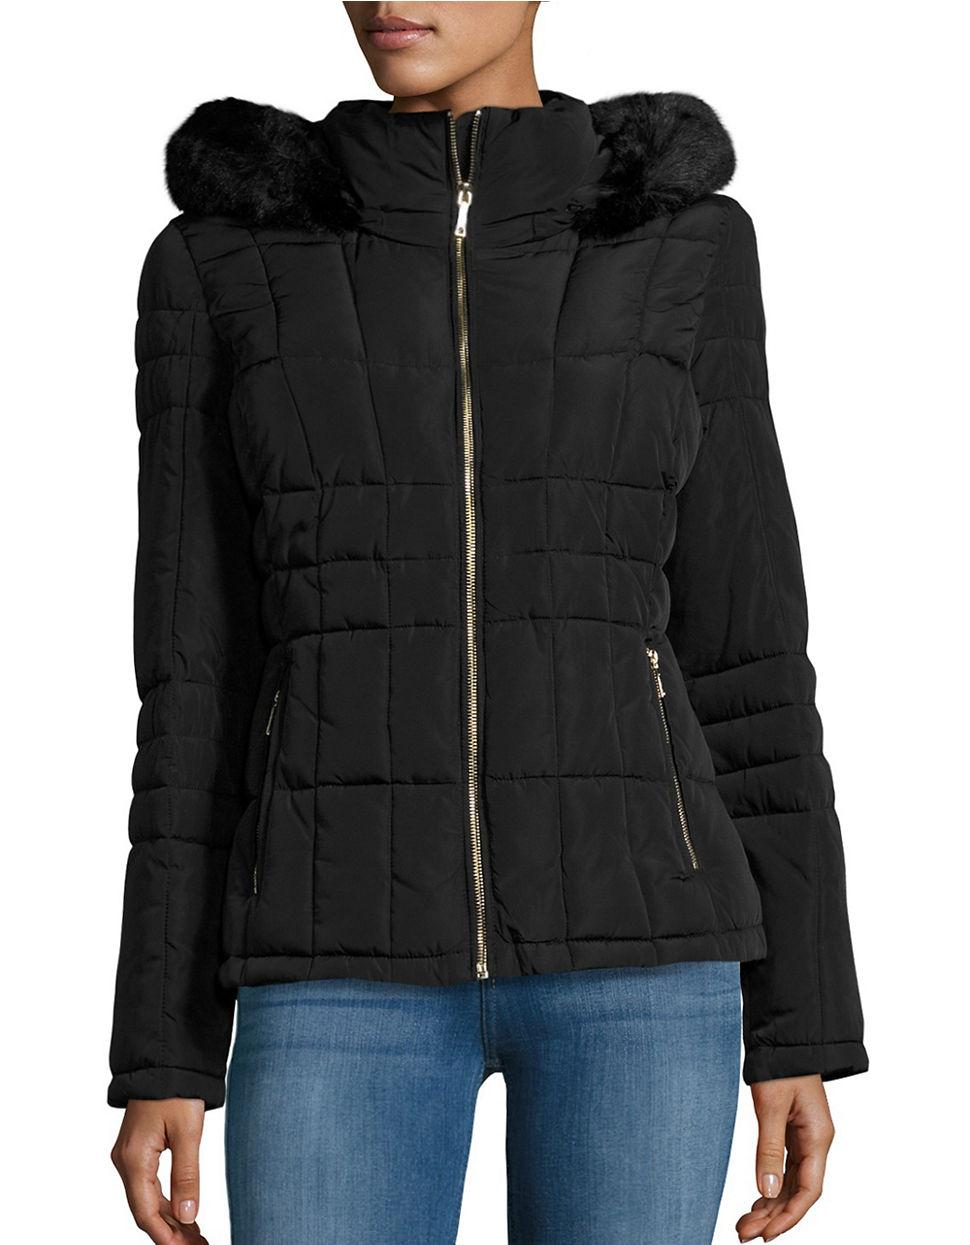 calvin-klein-puffer-coat.jpg